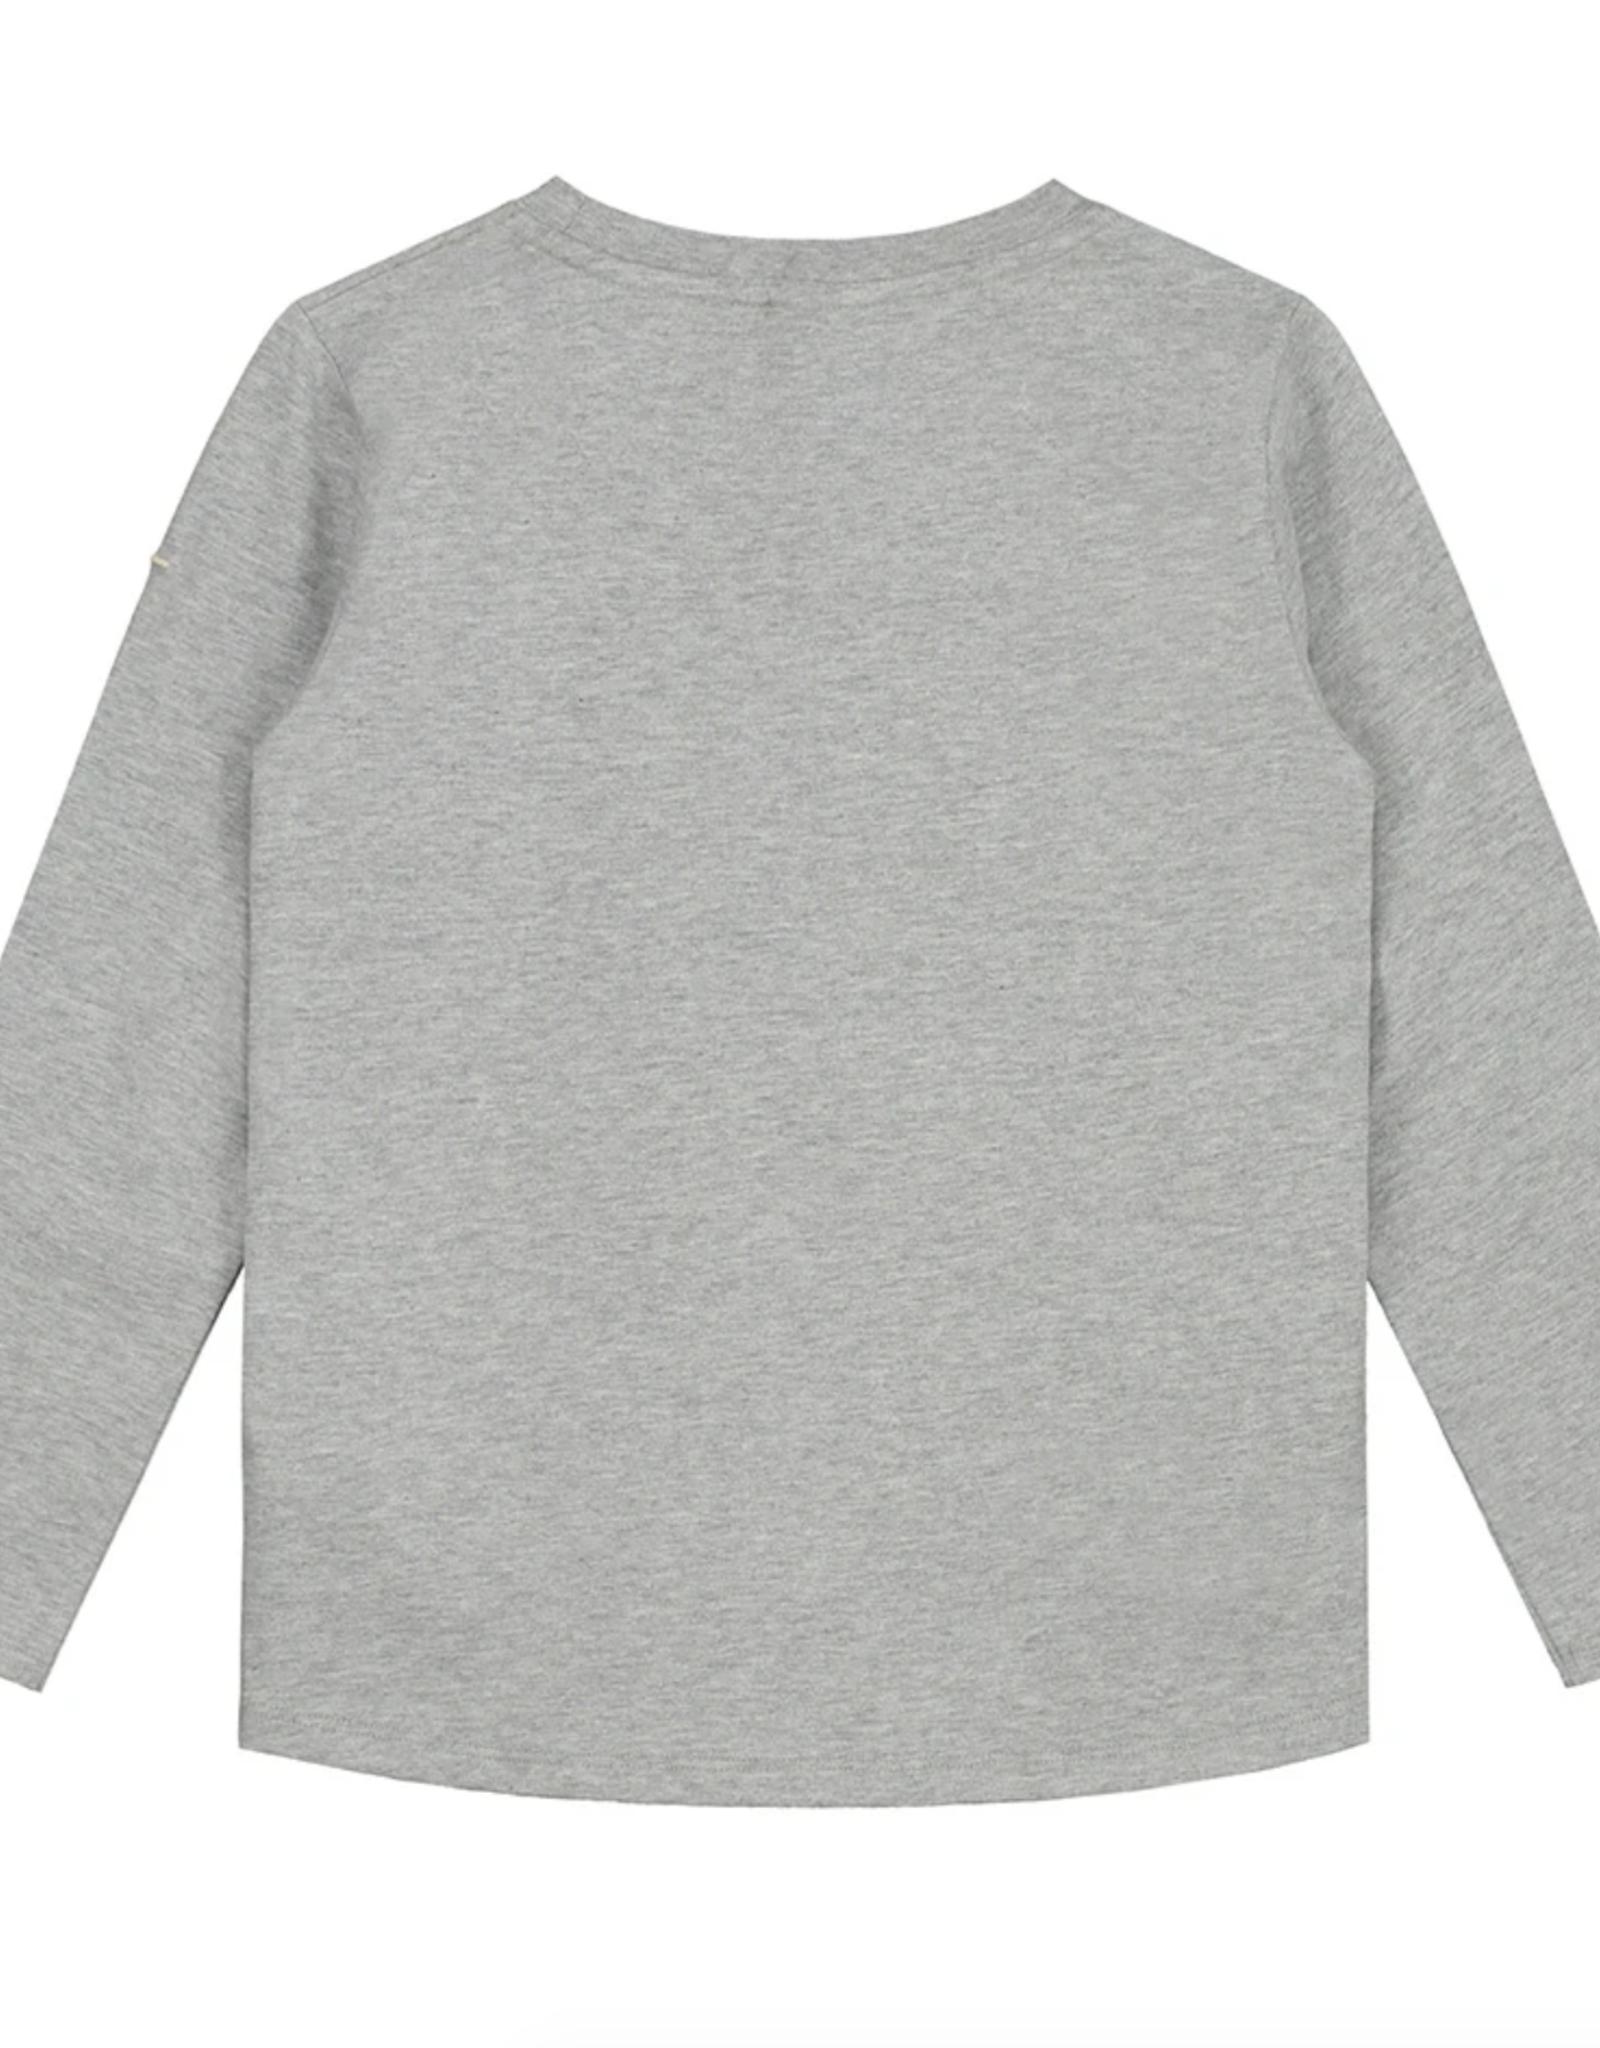 Gray Label Tee